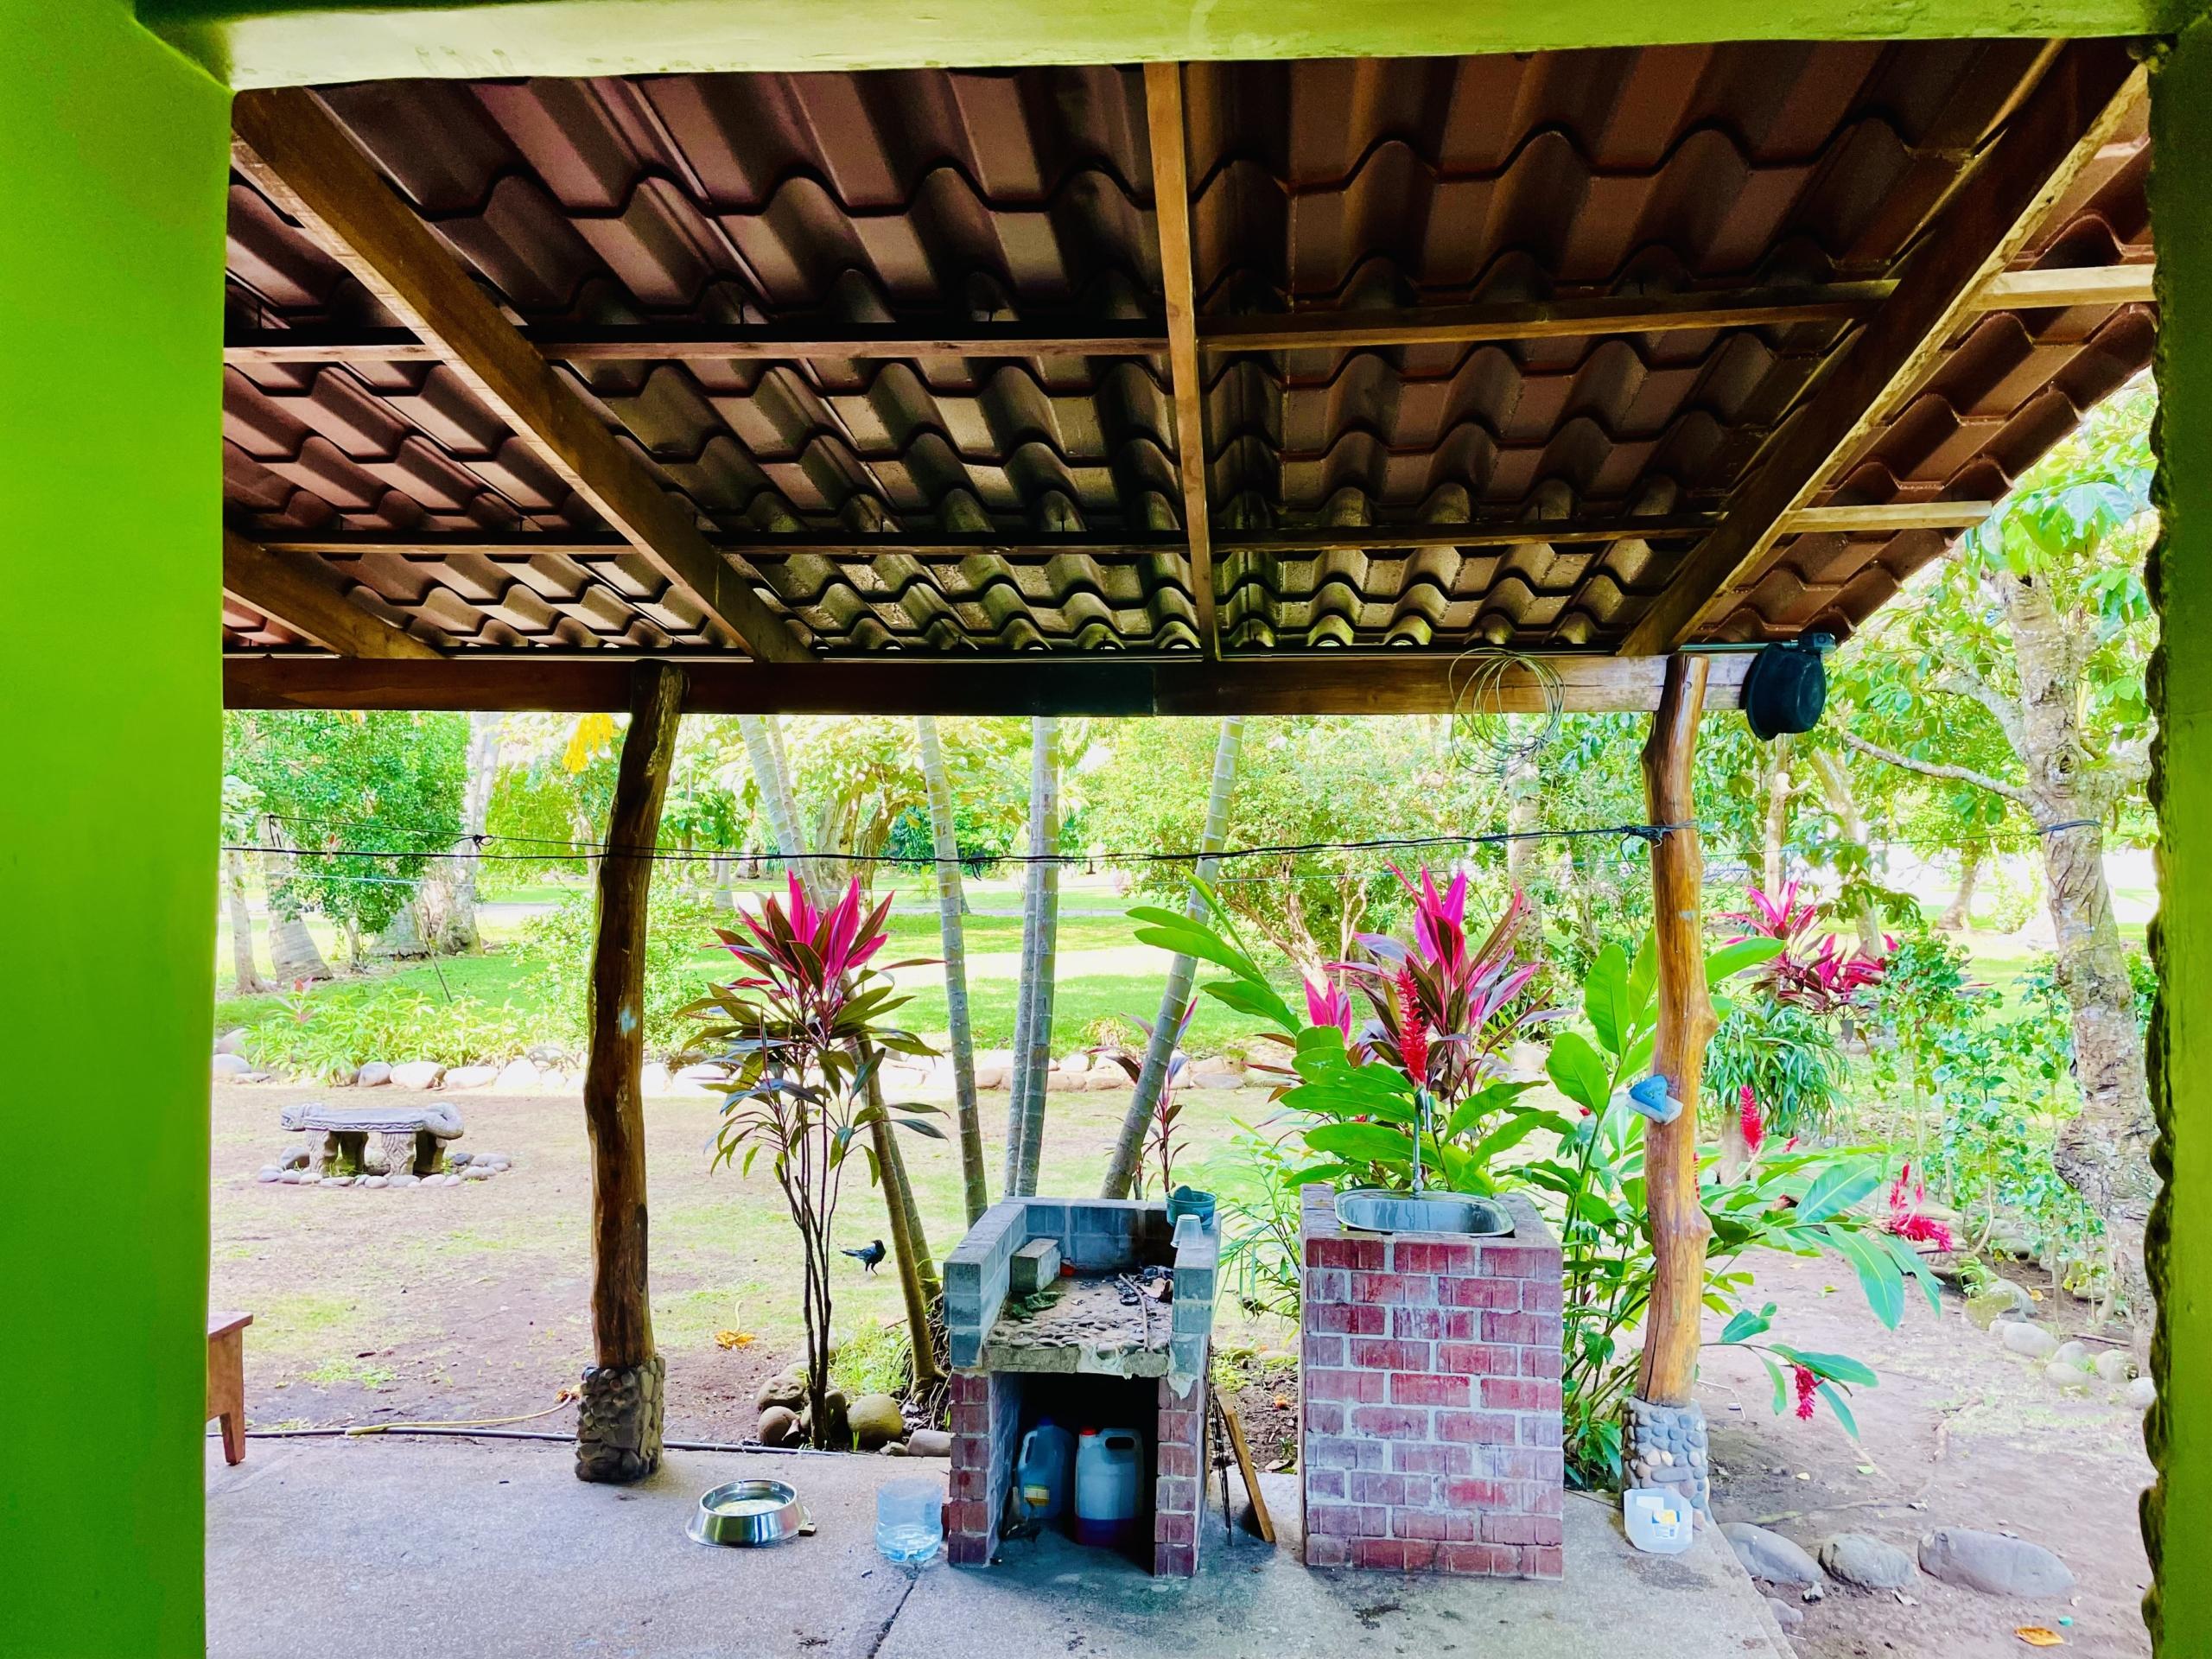 boca-barranca-costa-rica-villa-outdoor-grill